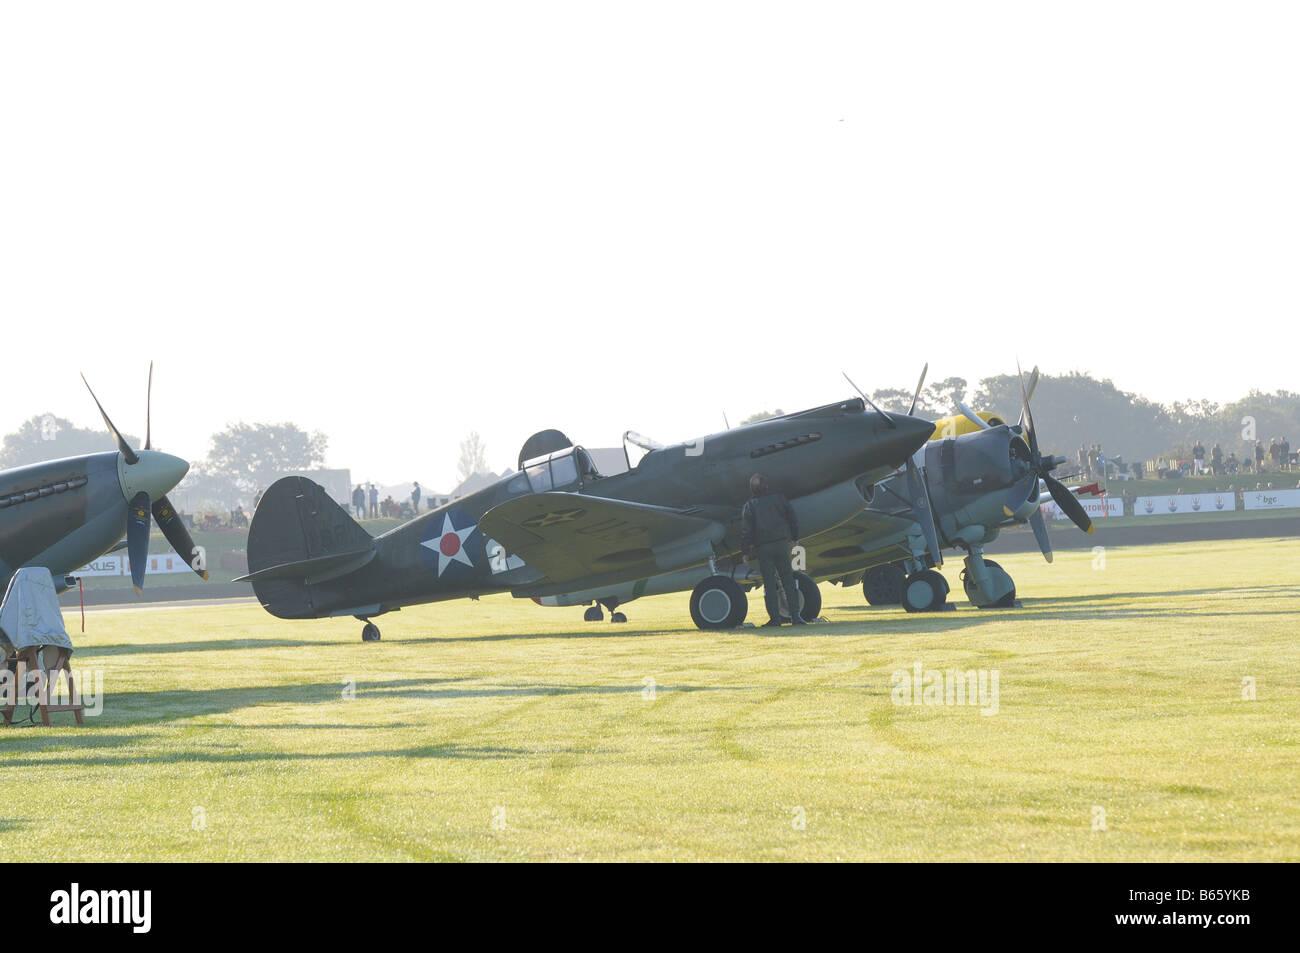 Curtiss P40B Warhawk Kittyhawk 1941 amongst a row of other ww2 planes - Stock Image